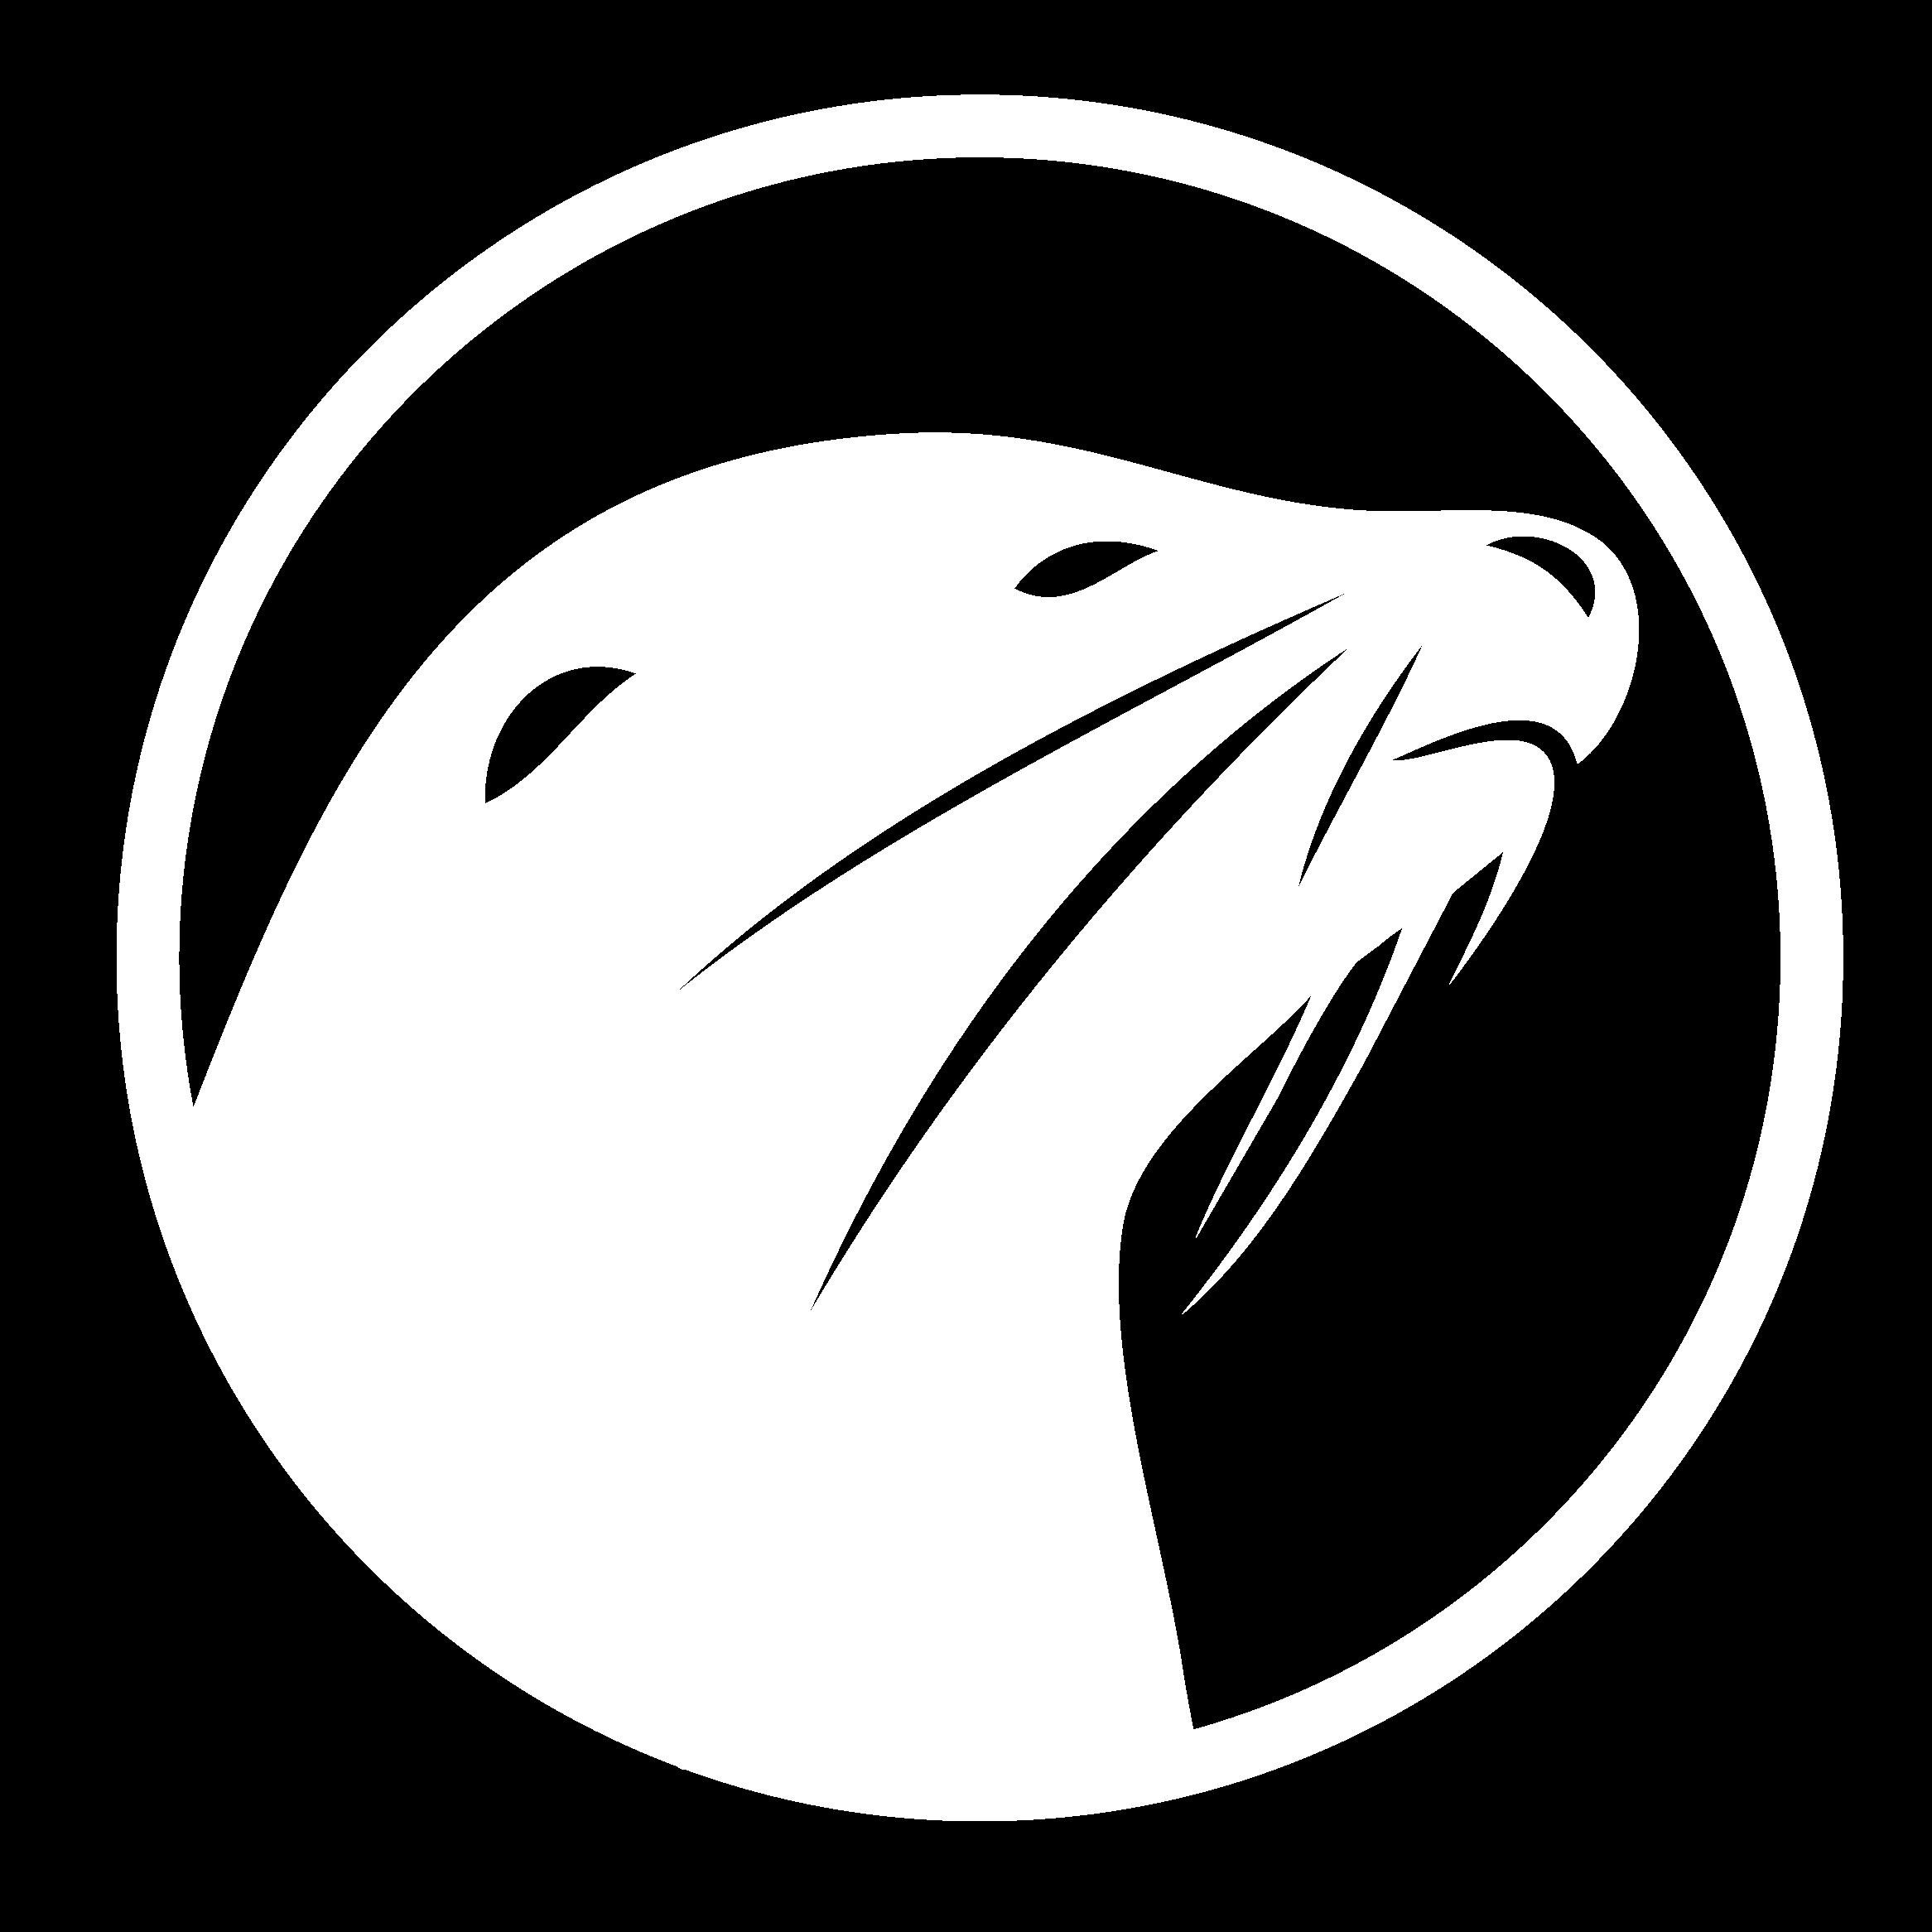 Coll Perske Memorial Fund for Marine Mammals